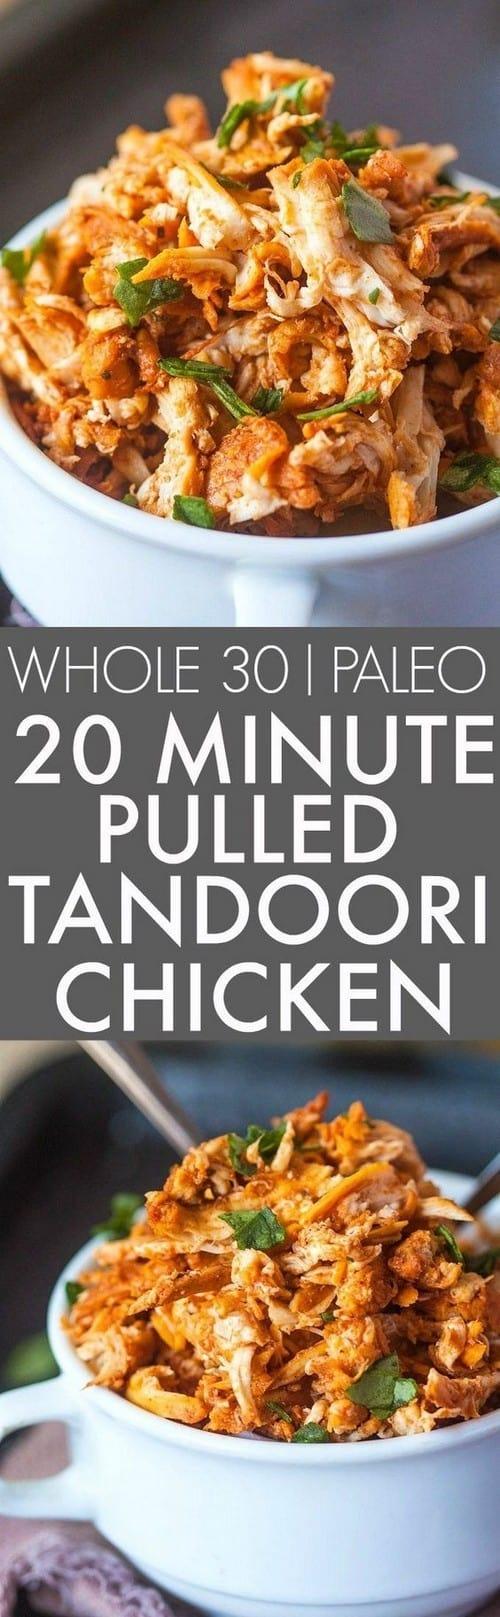 Whole30 Pulled Tandoori Chicken